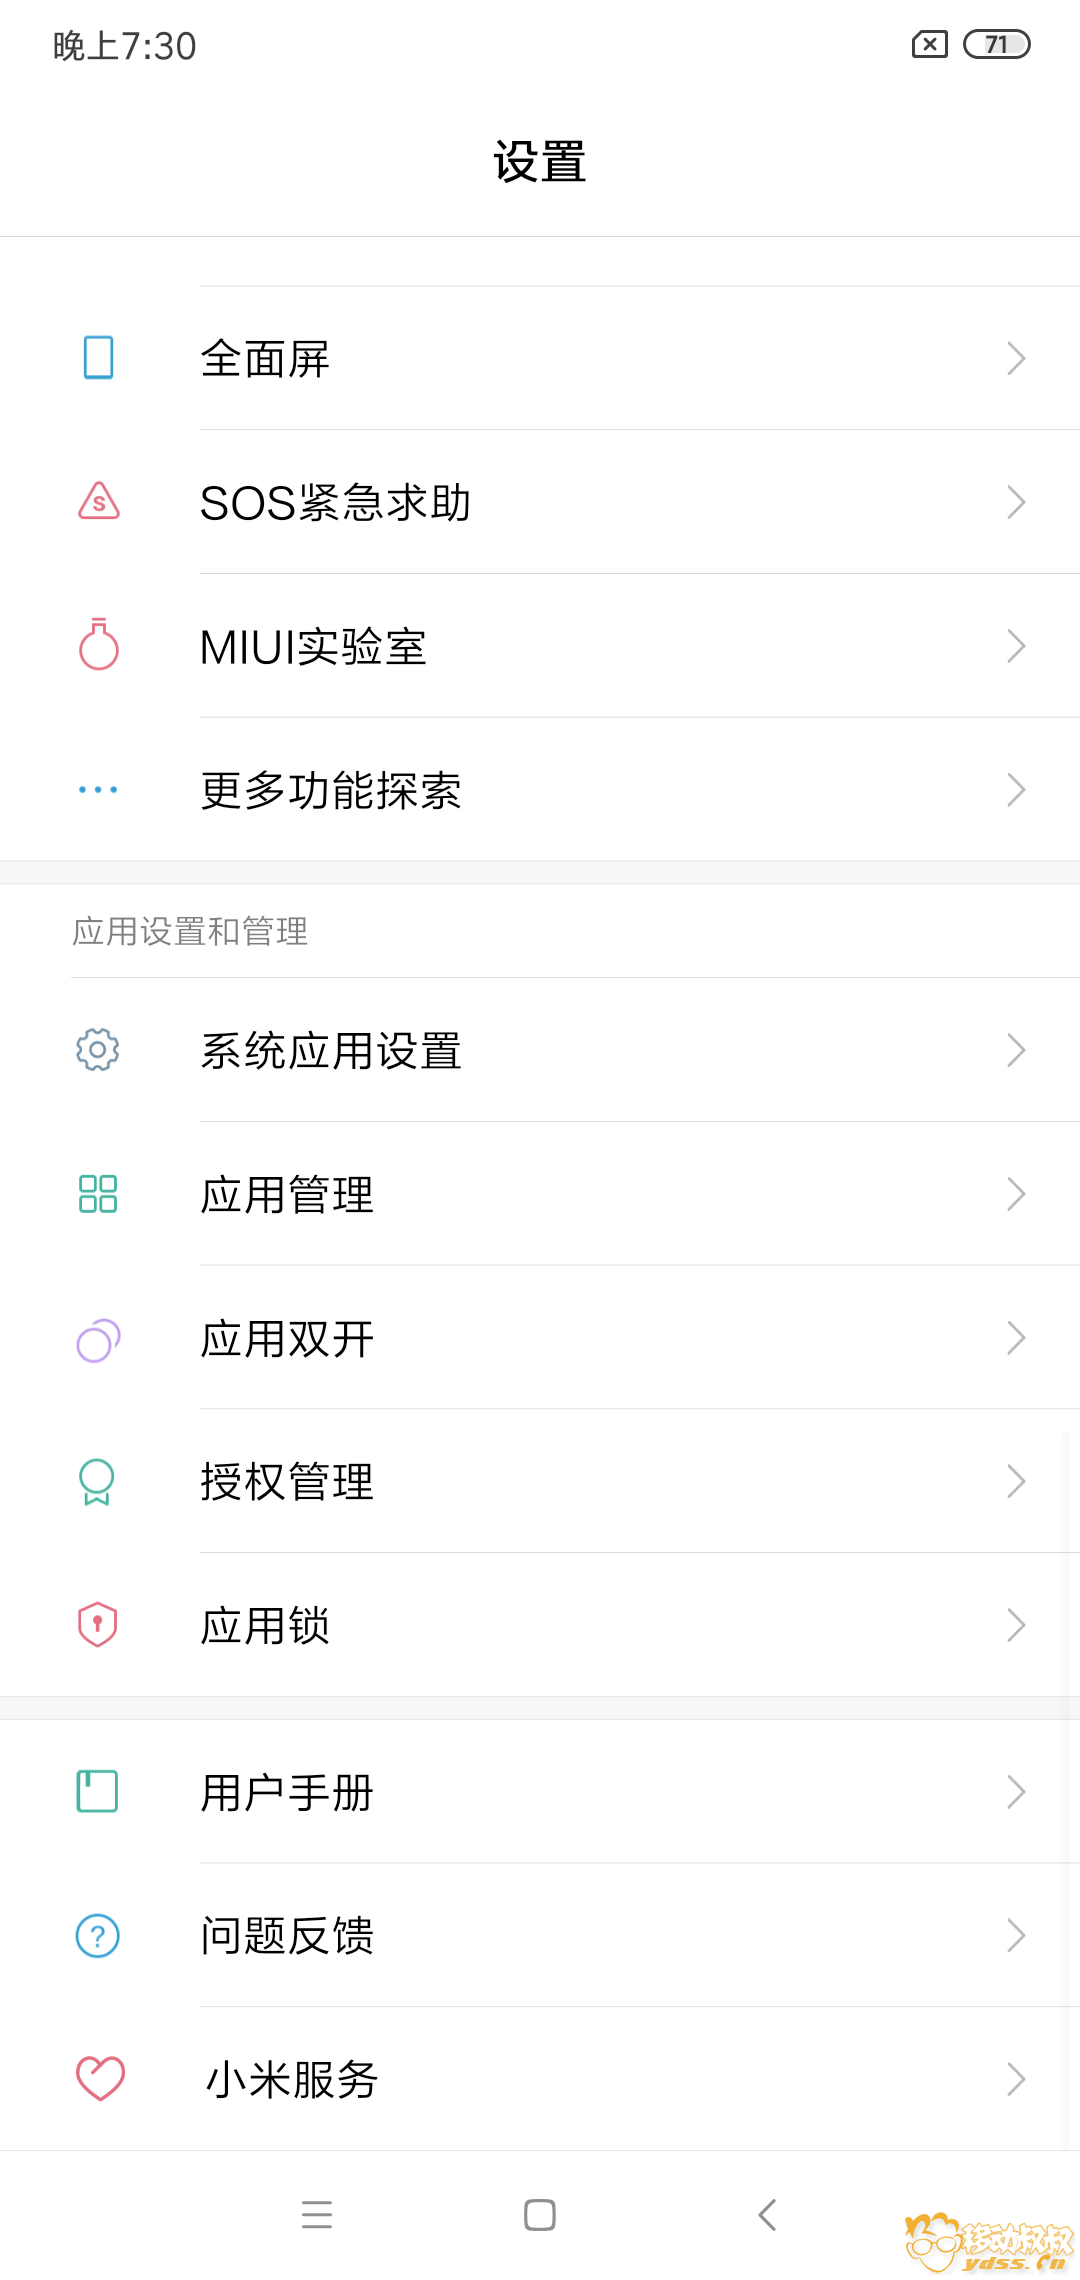 Screenshot_2019-04-12-19-30-10-340_com.android.settings.png